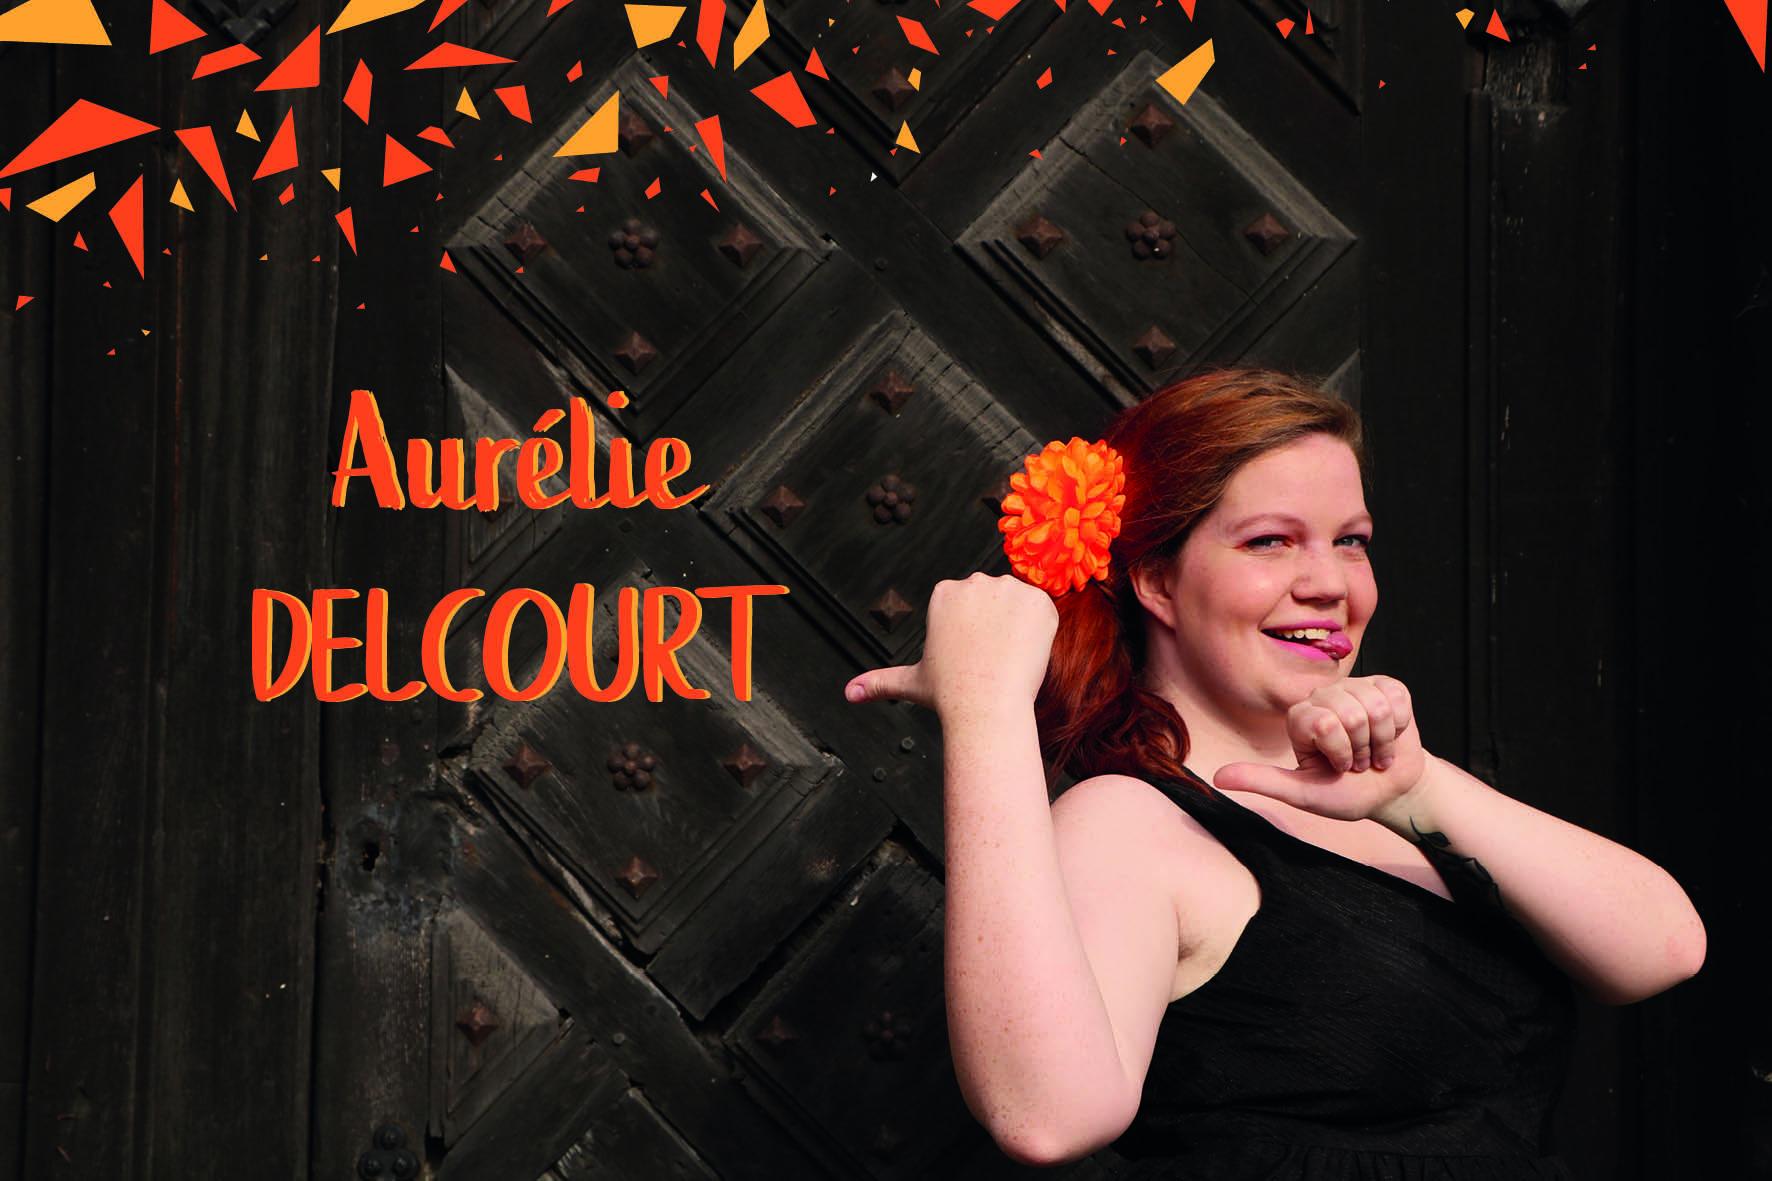 Aurélie Delcourt